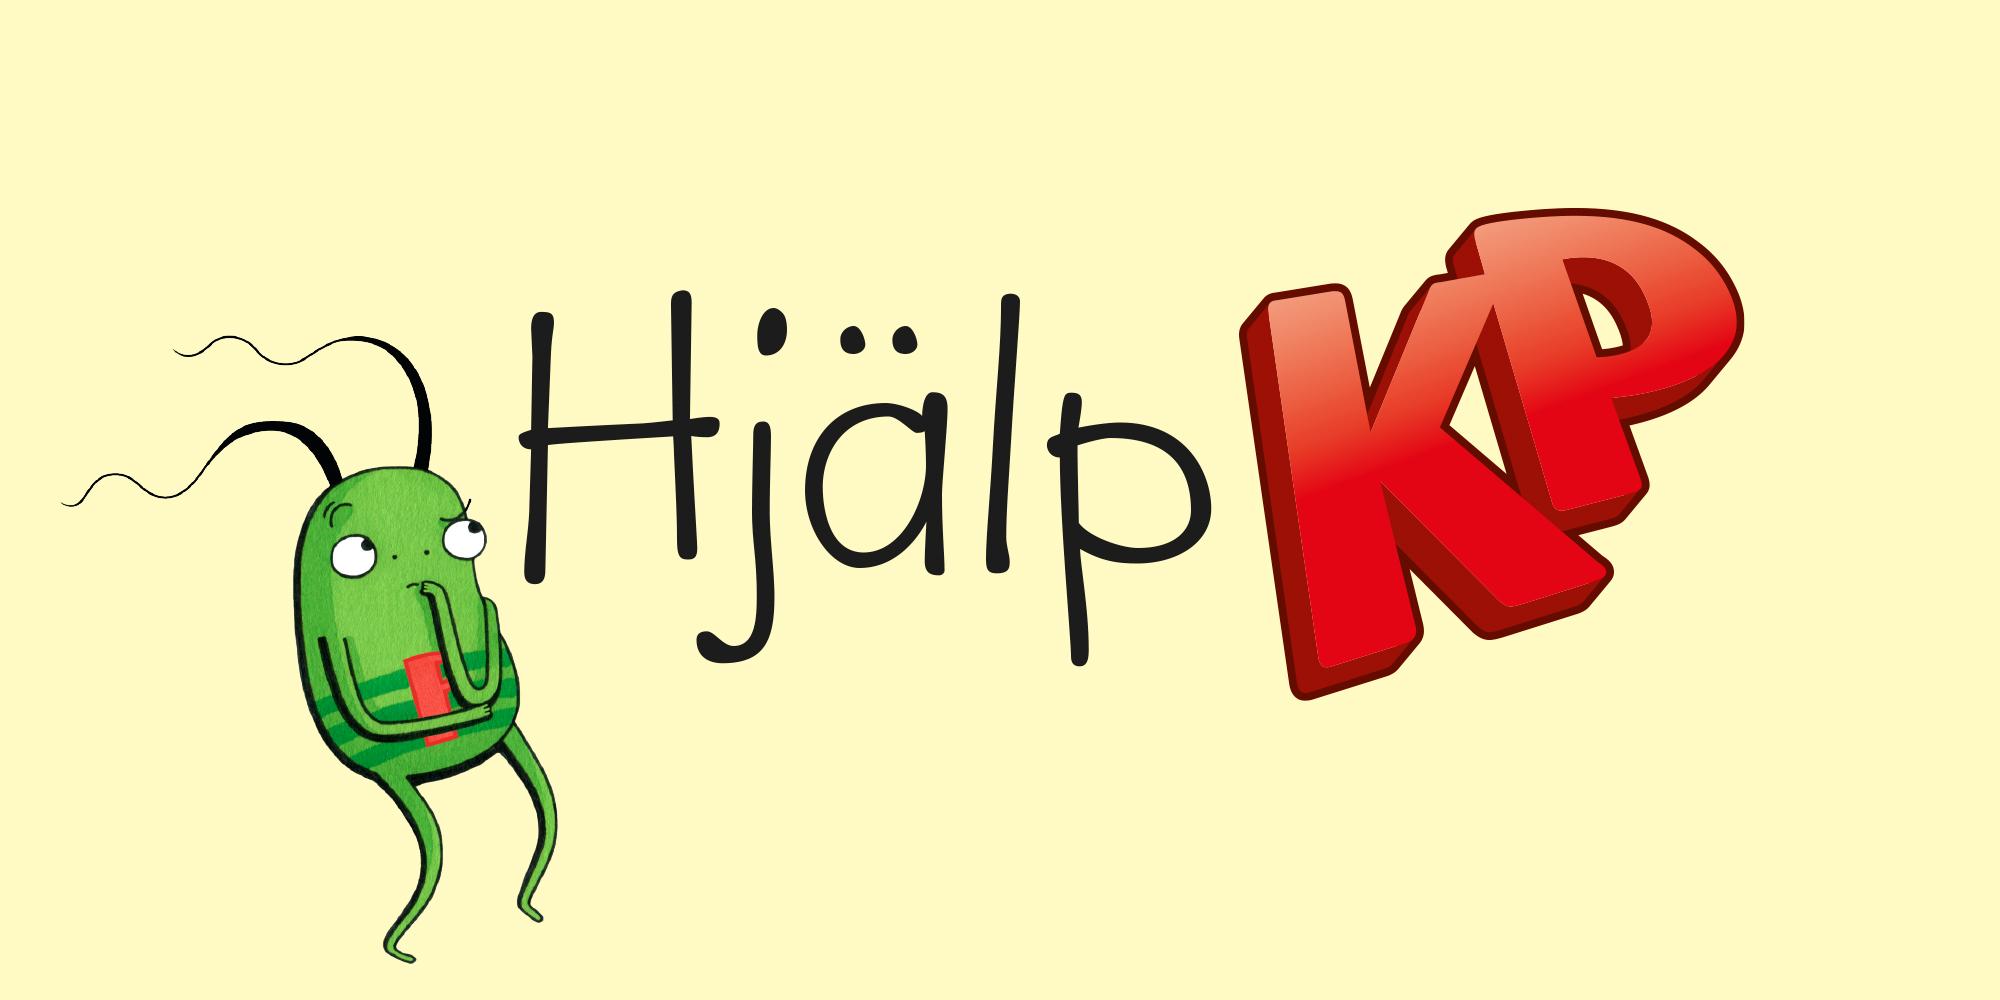 Hjälp KP